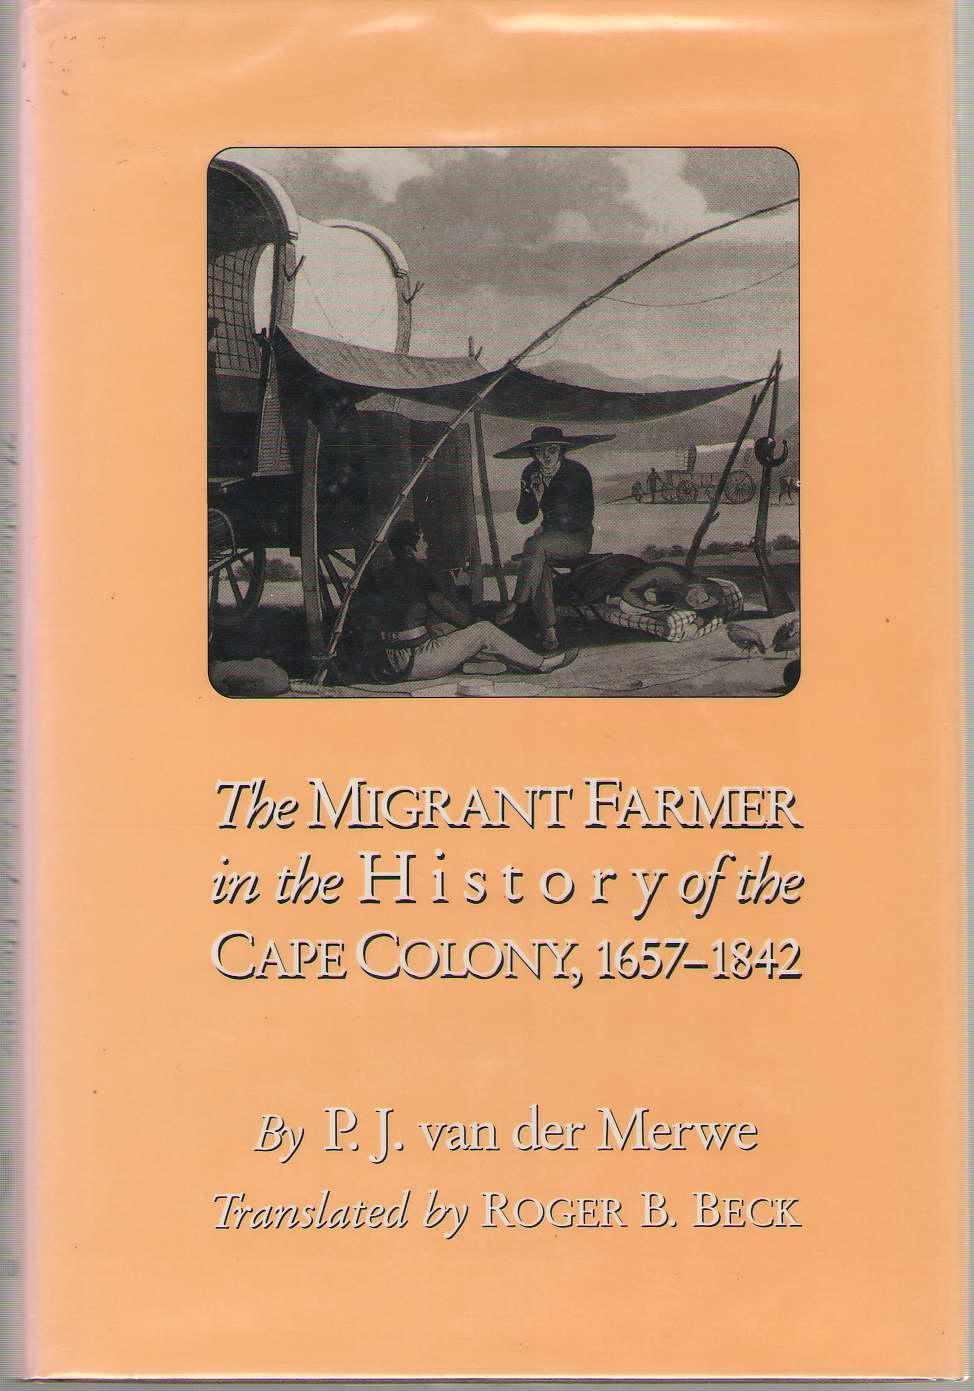 Migrant Farmer In History Of Cape Colony  1657-1842, Van Der Merwe, P.J. &  Roger B. Beck